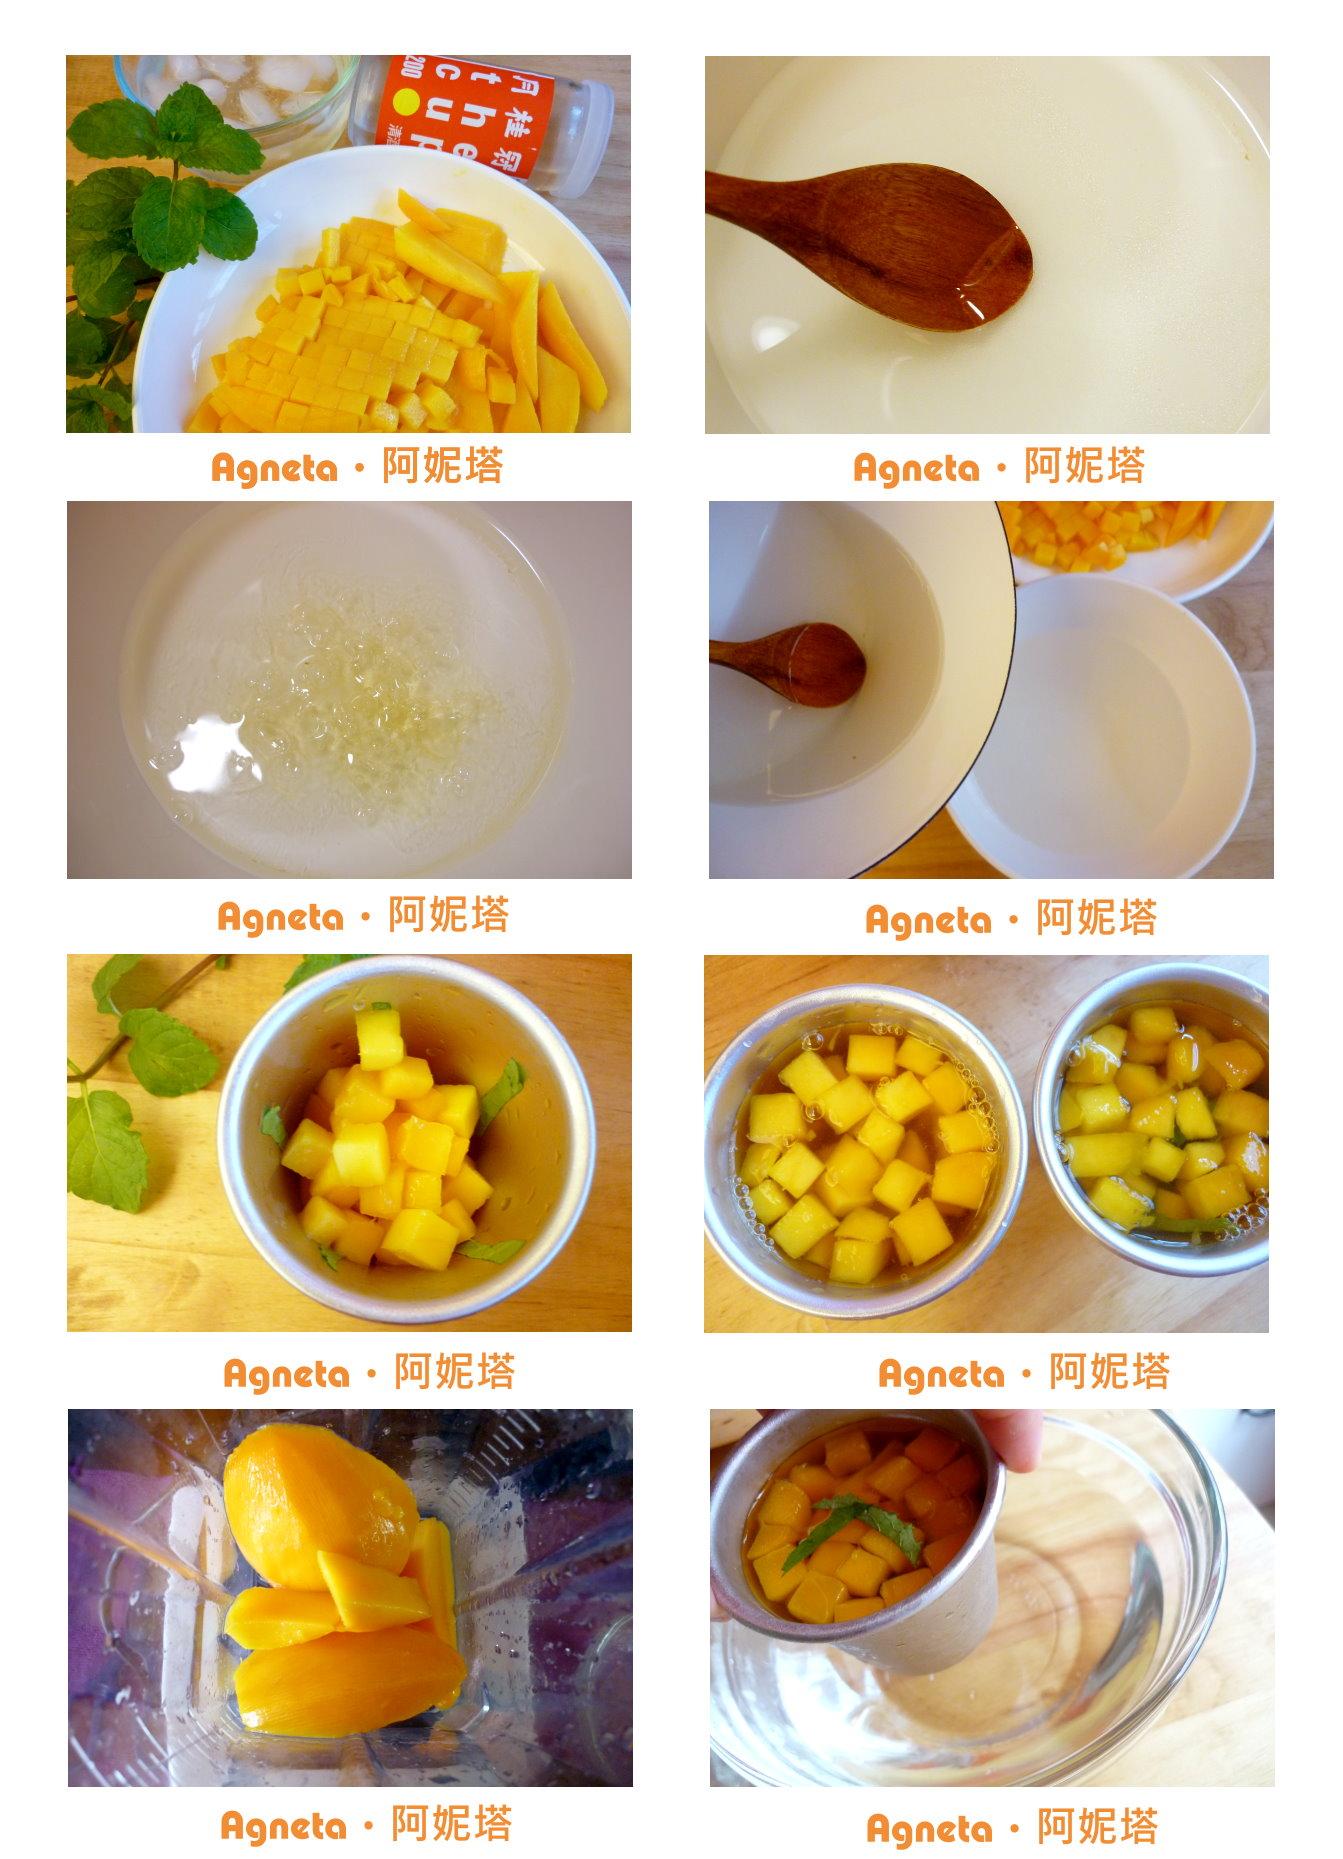 mango sake jelly